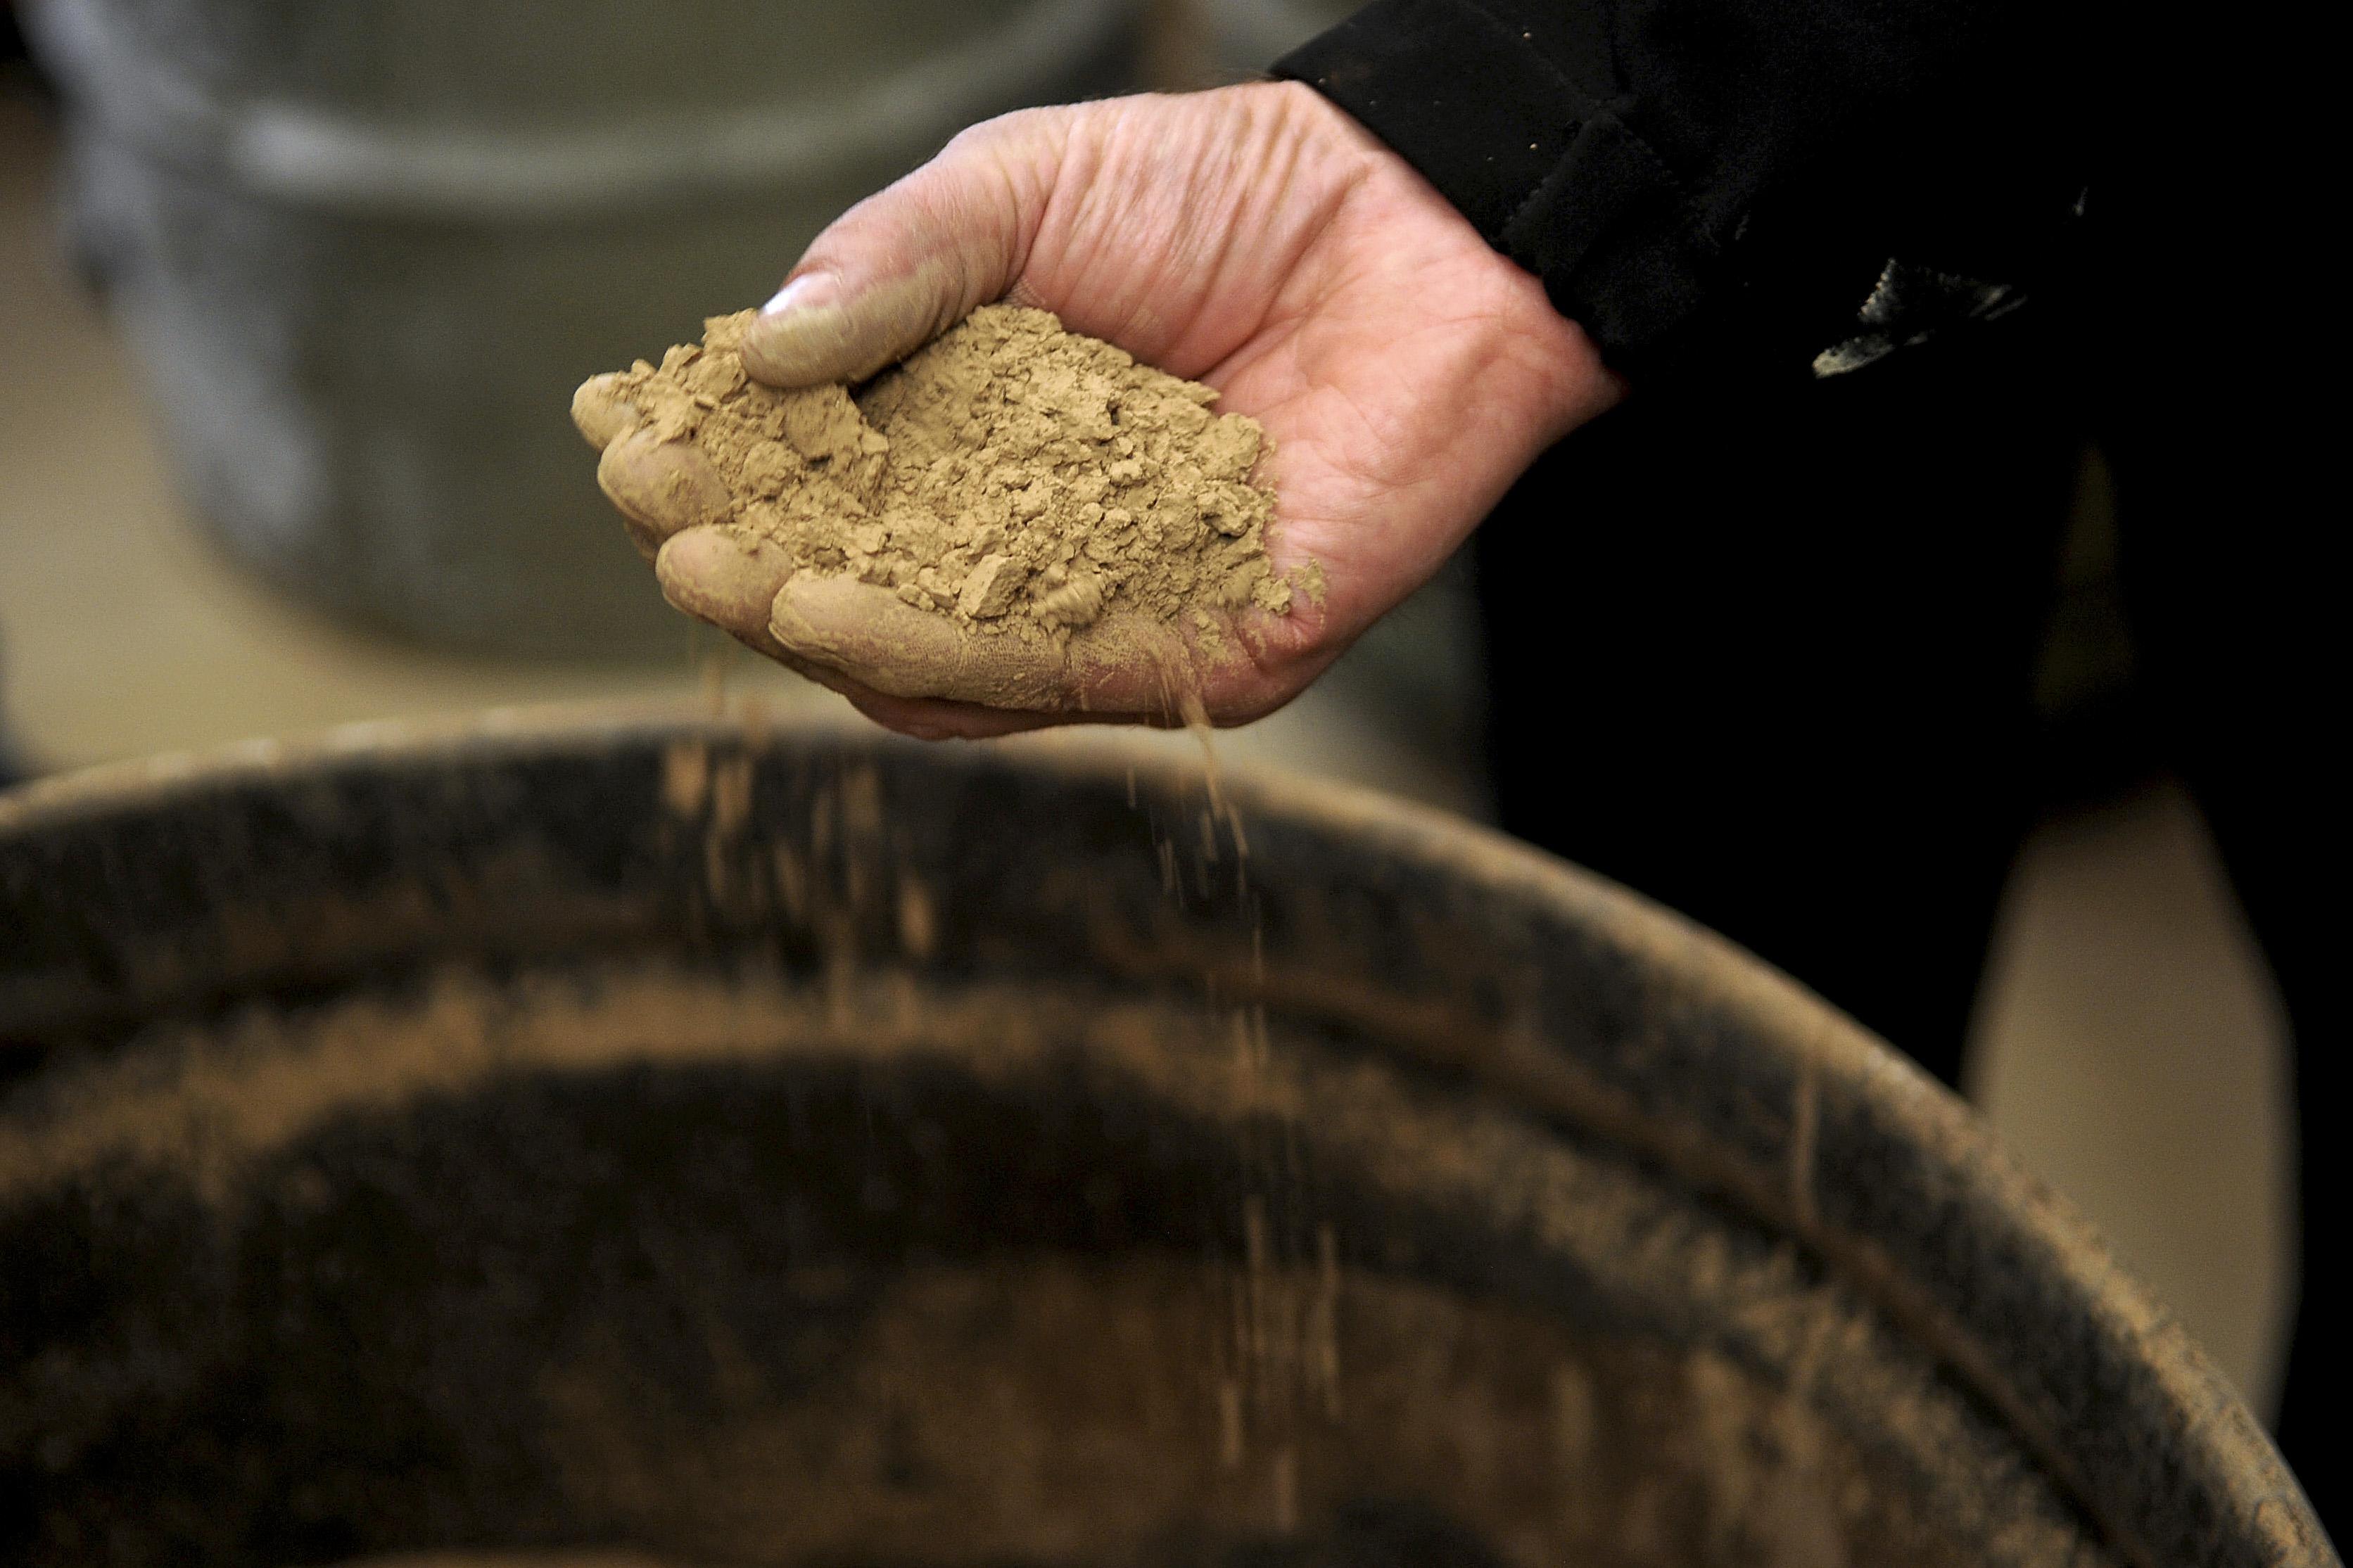 Molycorp Mountain Pass Rare Earths Mining Facility